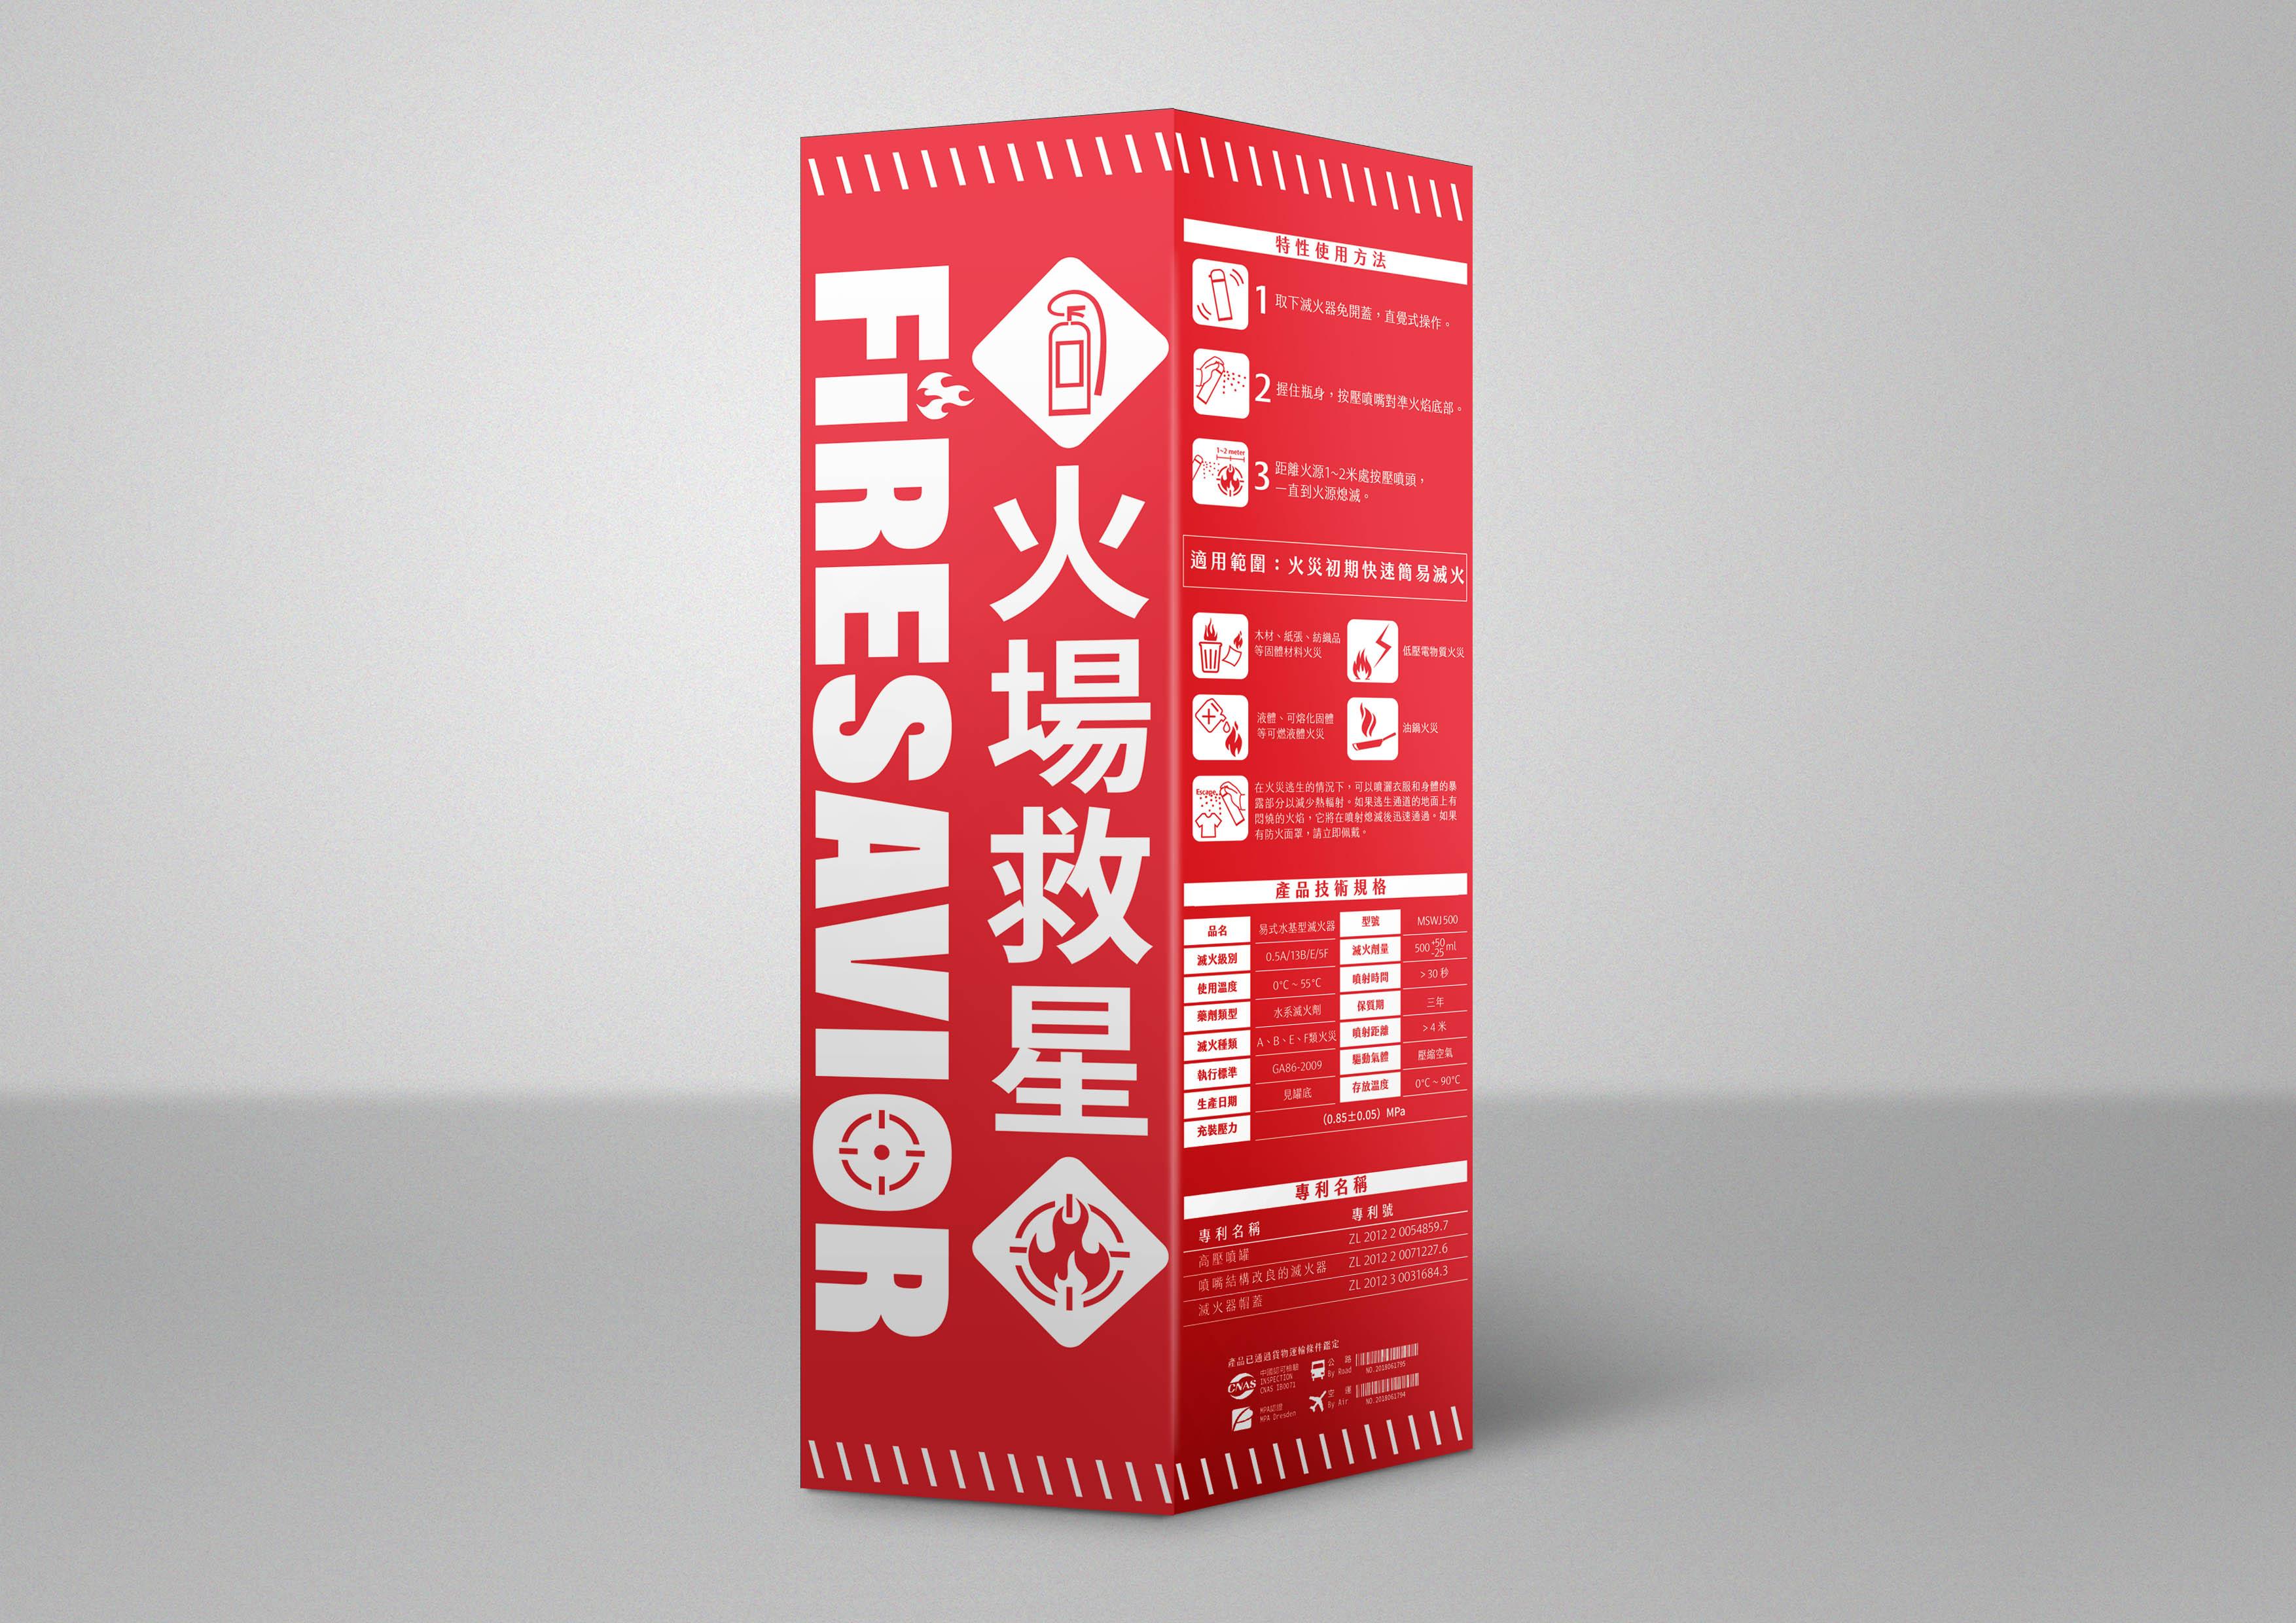 firesaver demo